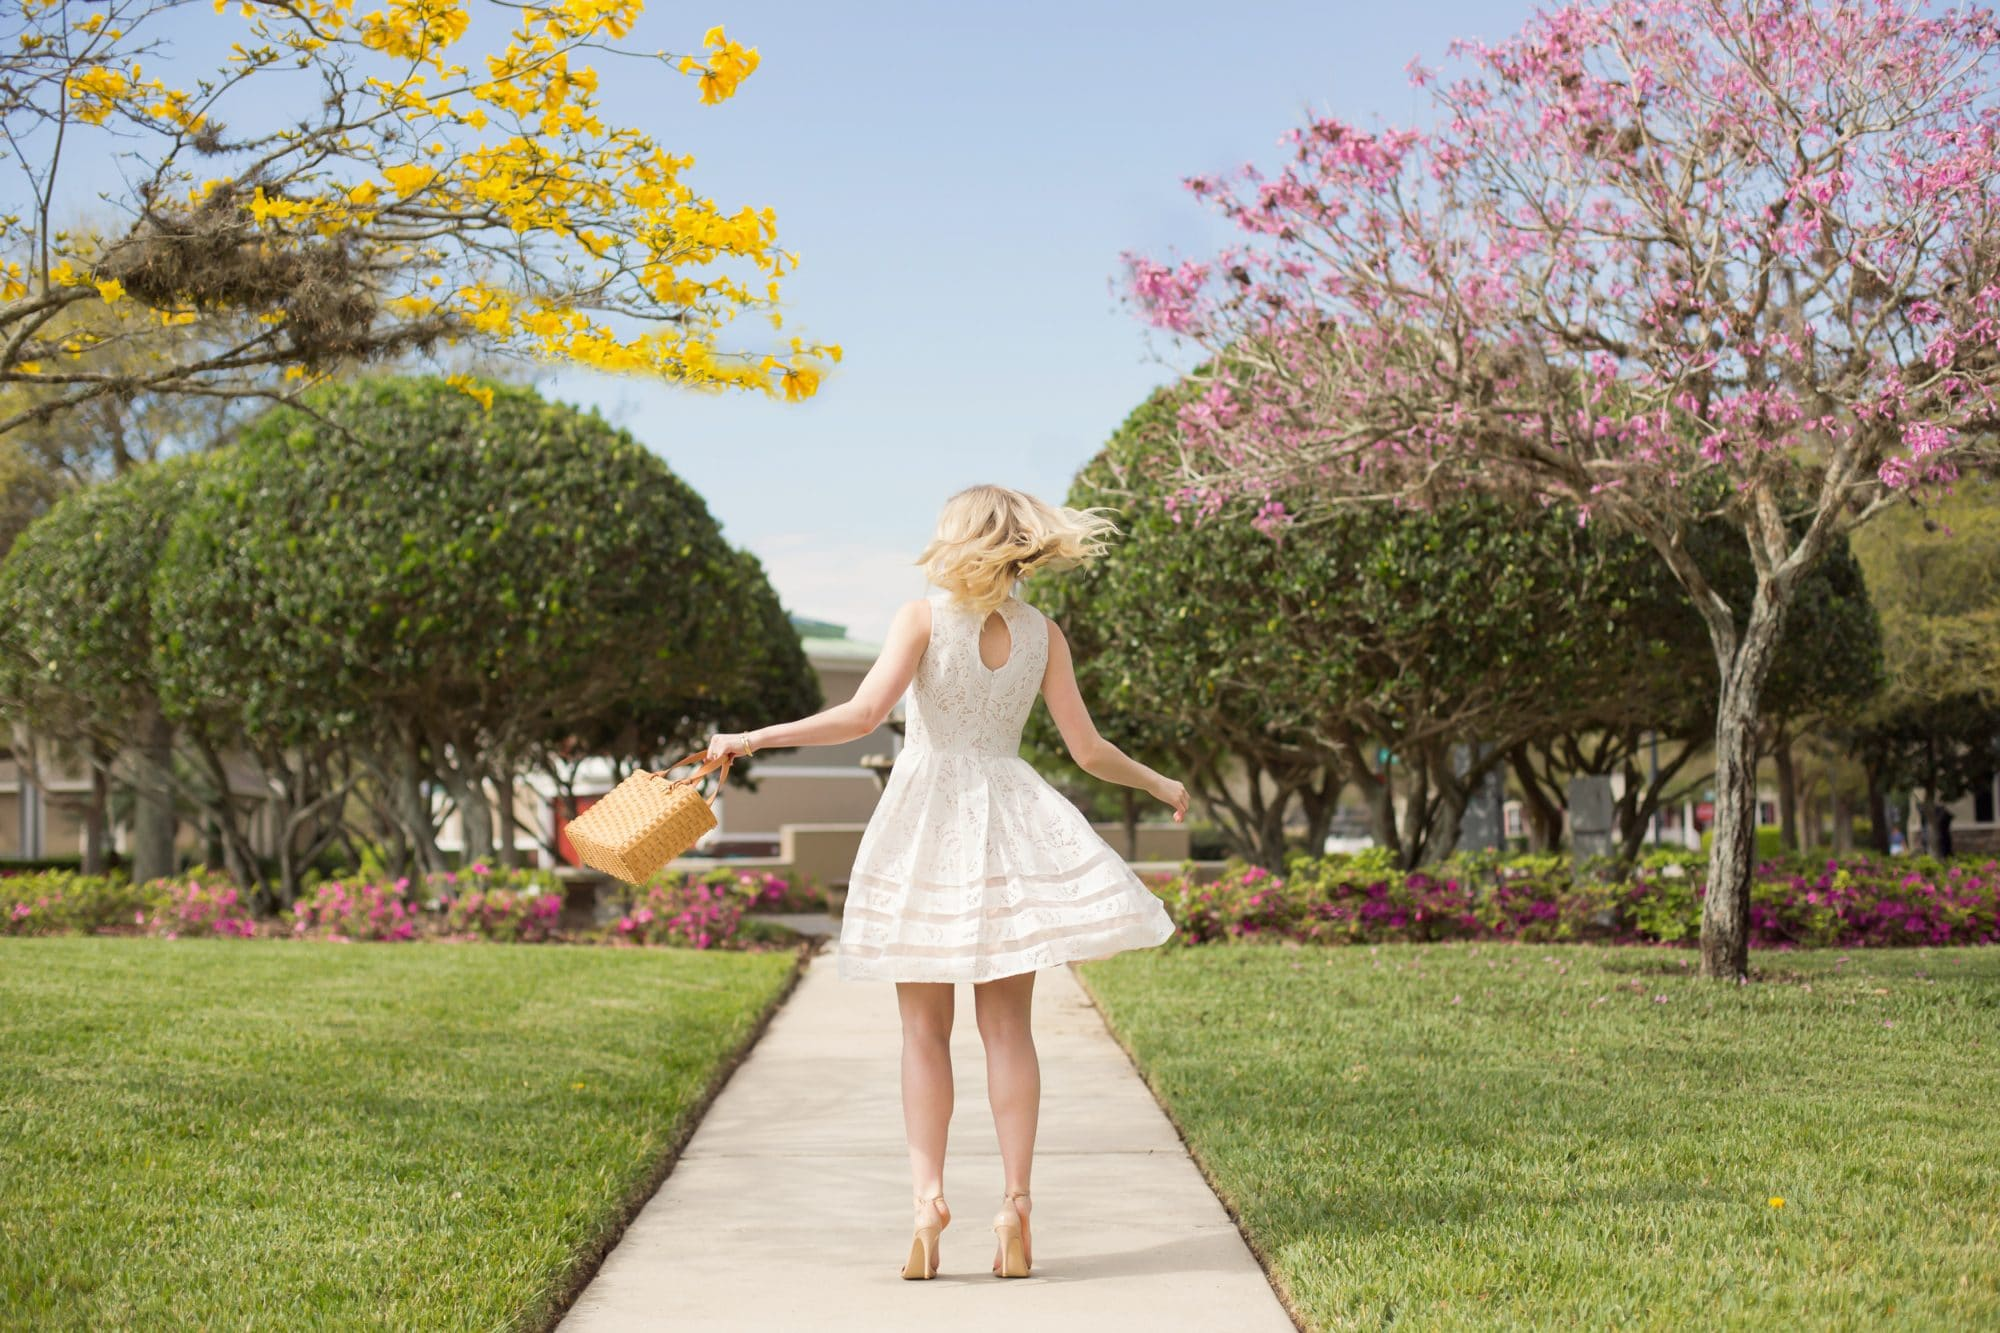 Spring White Dress - Twirling | www.ashleybrookedesigns.com